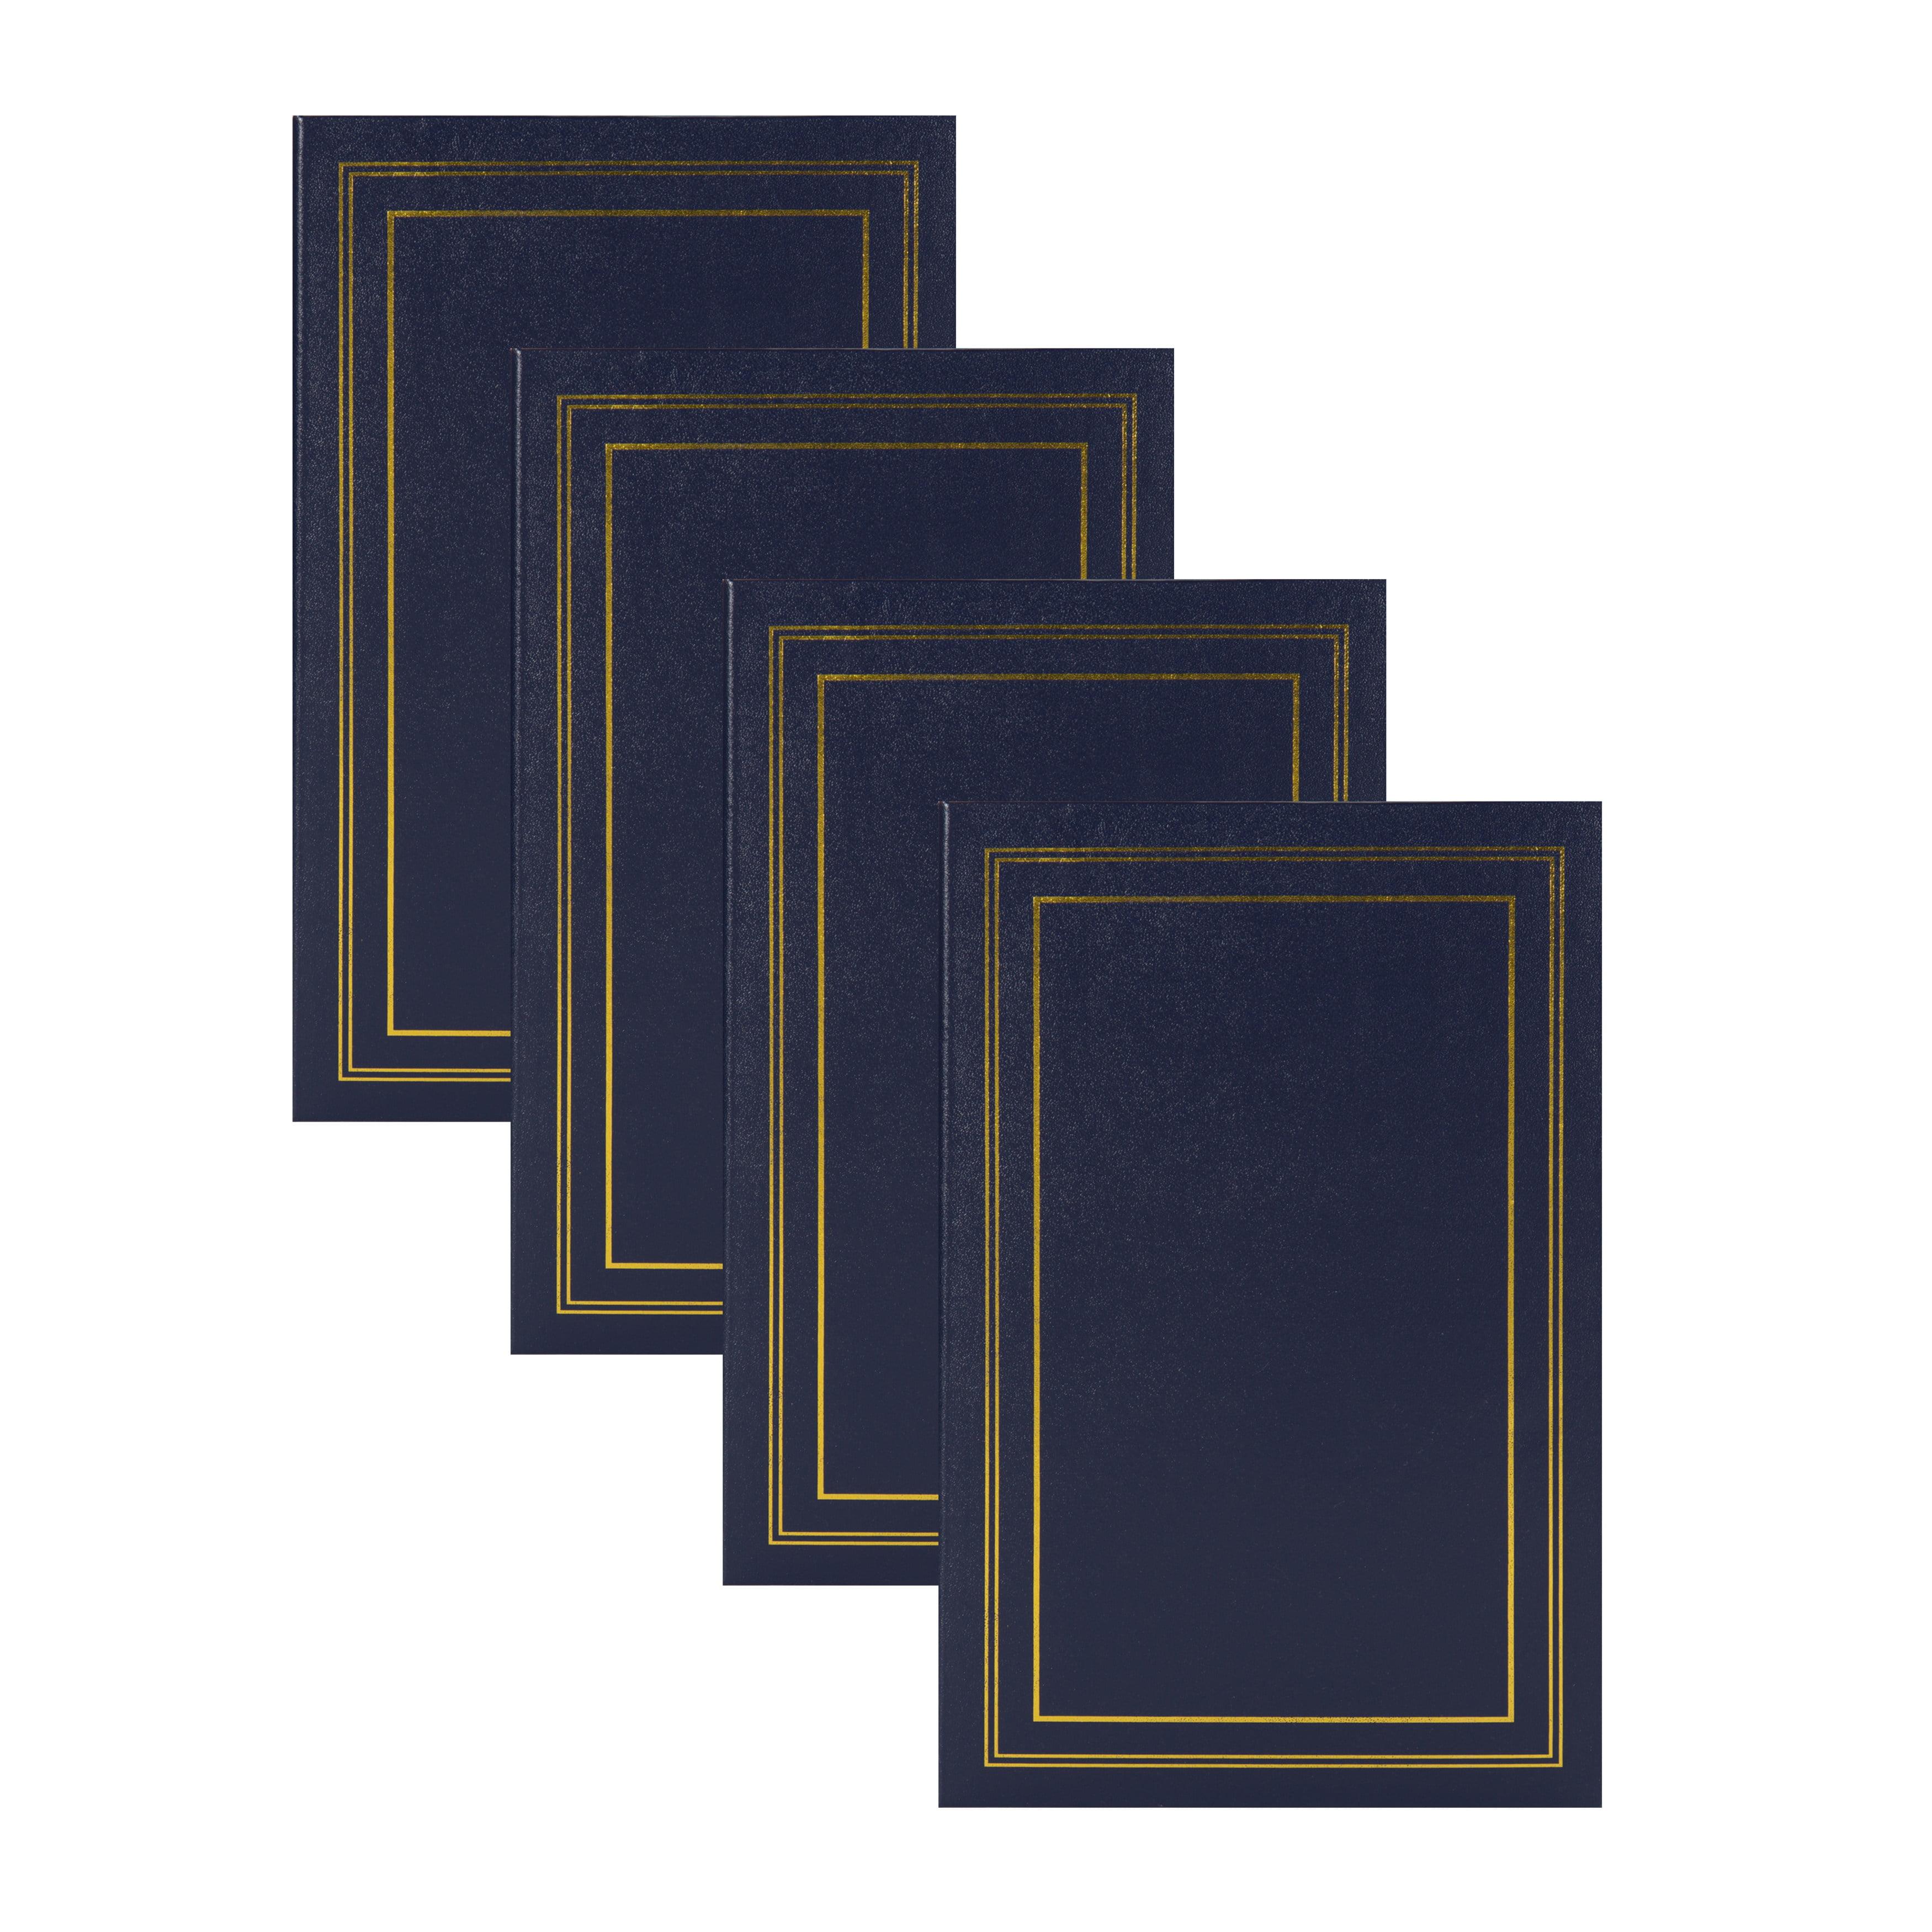 DesignOvation Traditional Photo Albums, Holds 300 4x6 Photos, Set of 4, Navy Blue by Uniek